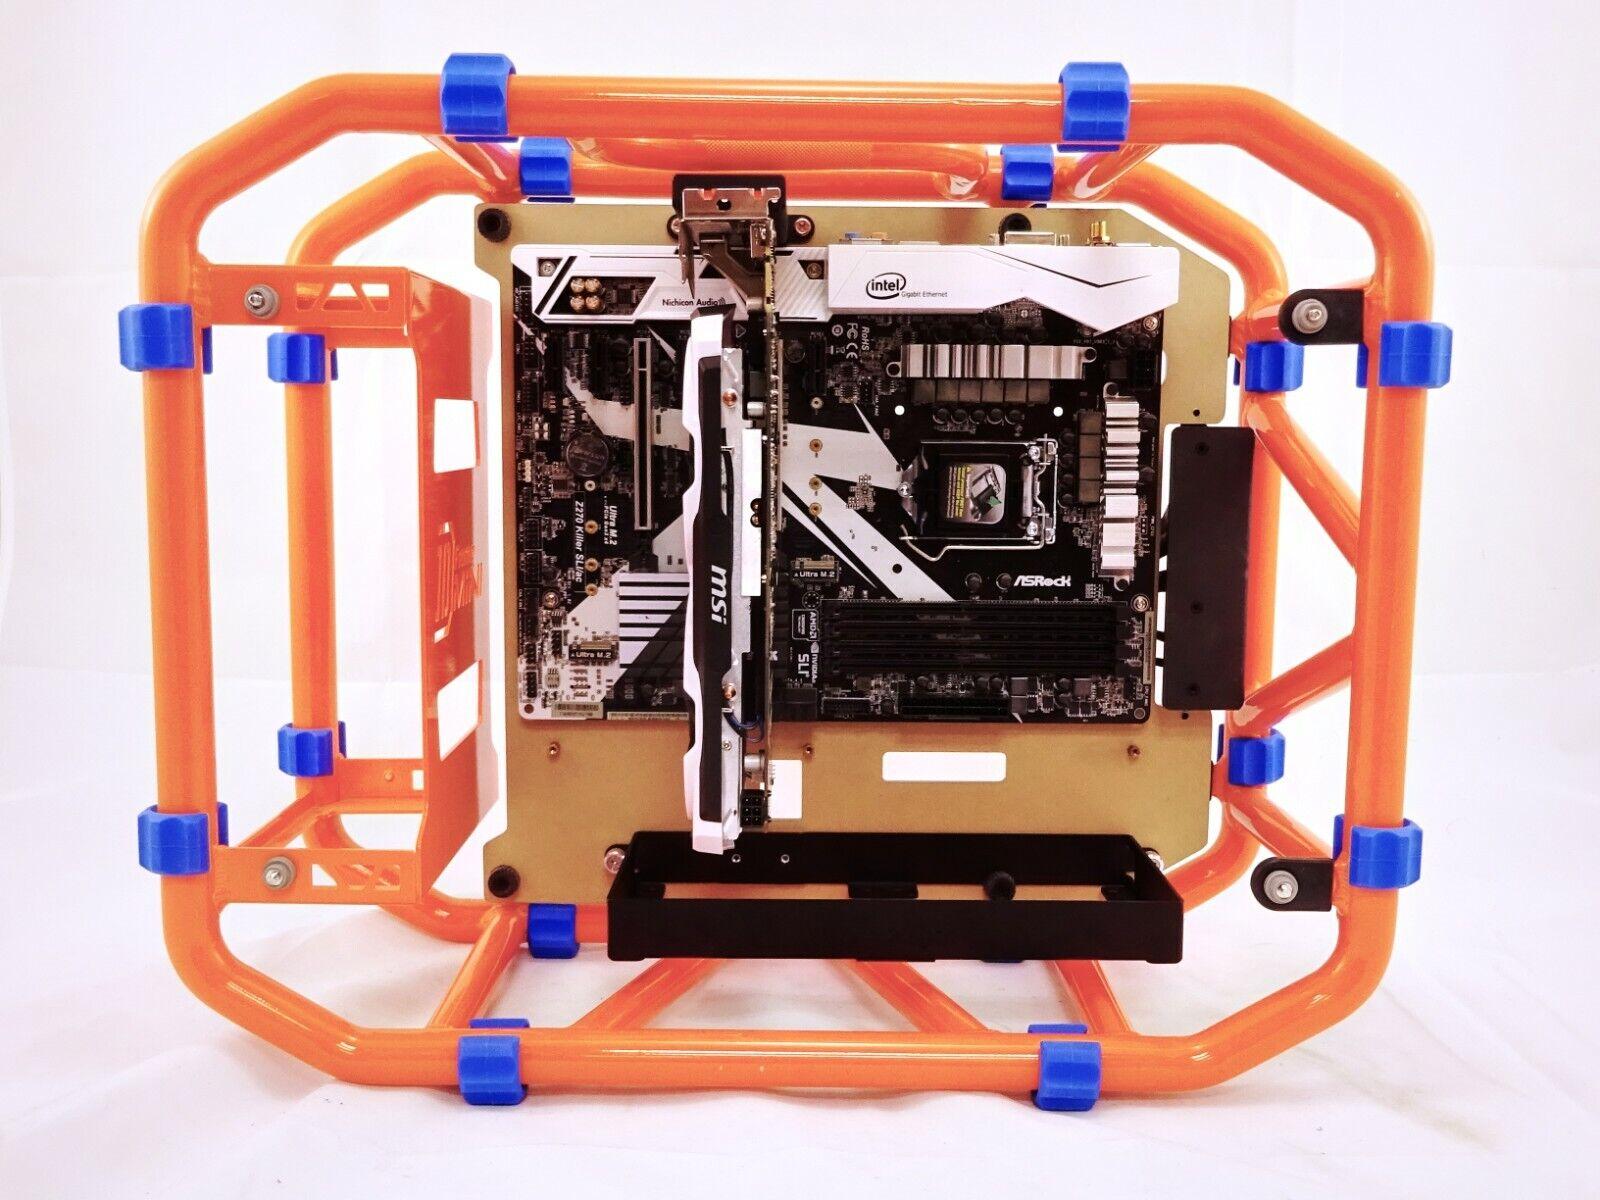 как выглядит MunkyMods In-Win Mini D-Frame Custom ATX Motherboard Mounting Tray Inwin Dframe фото